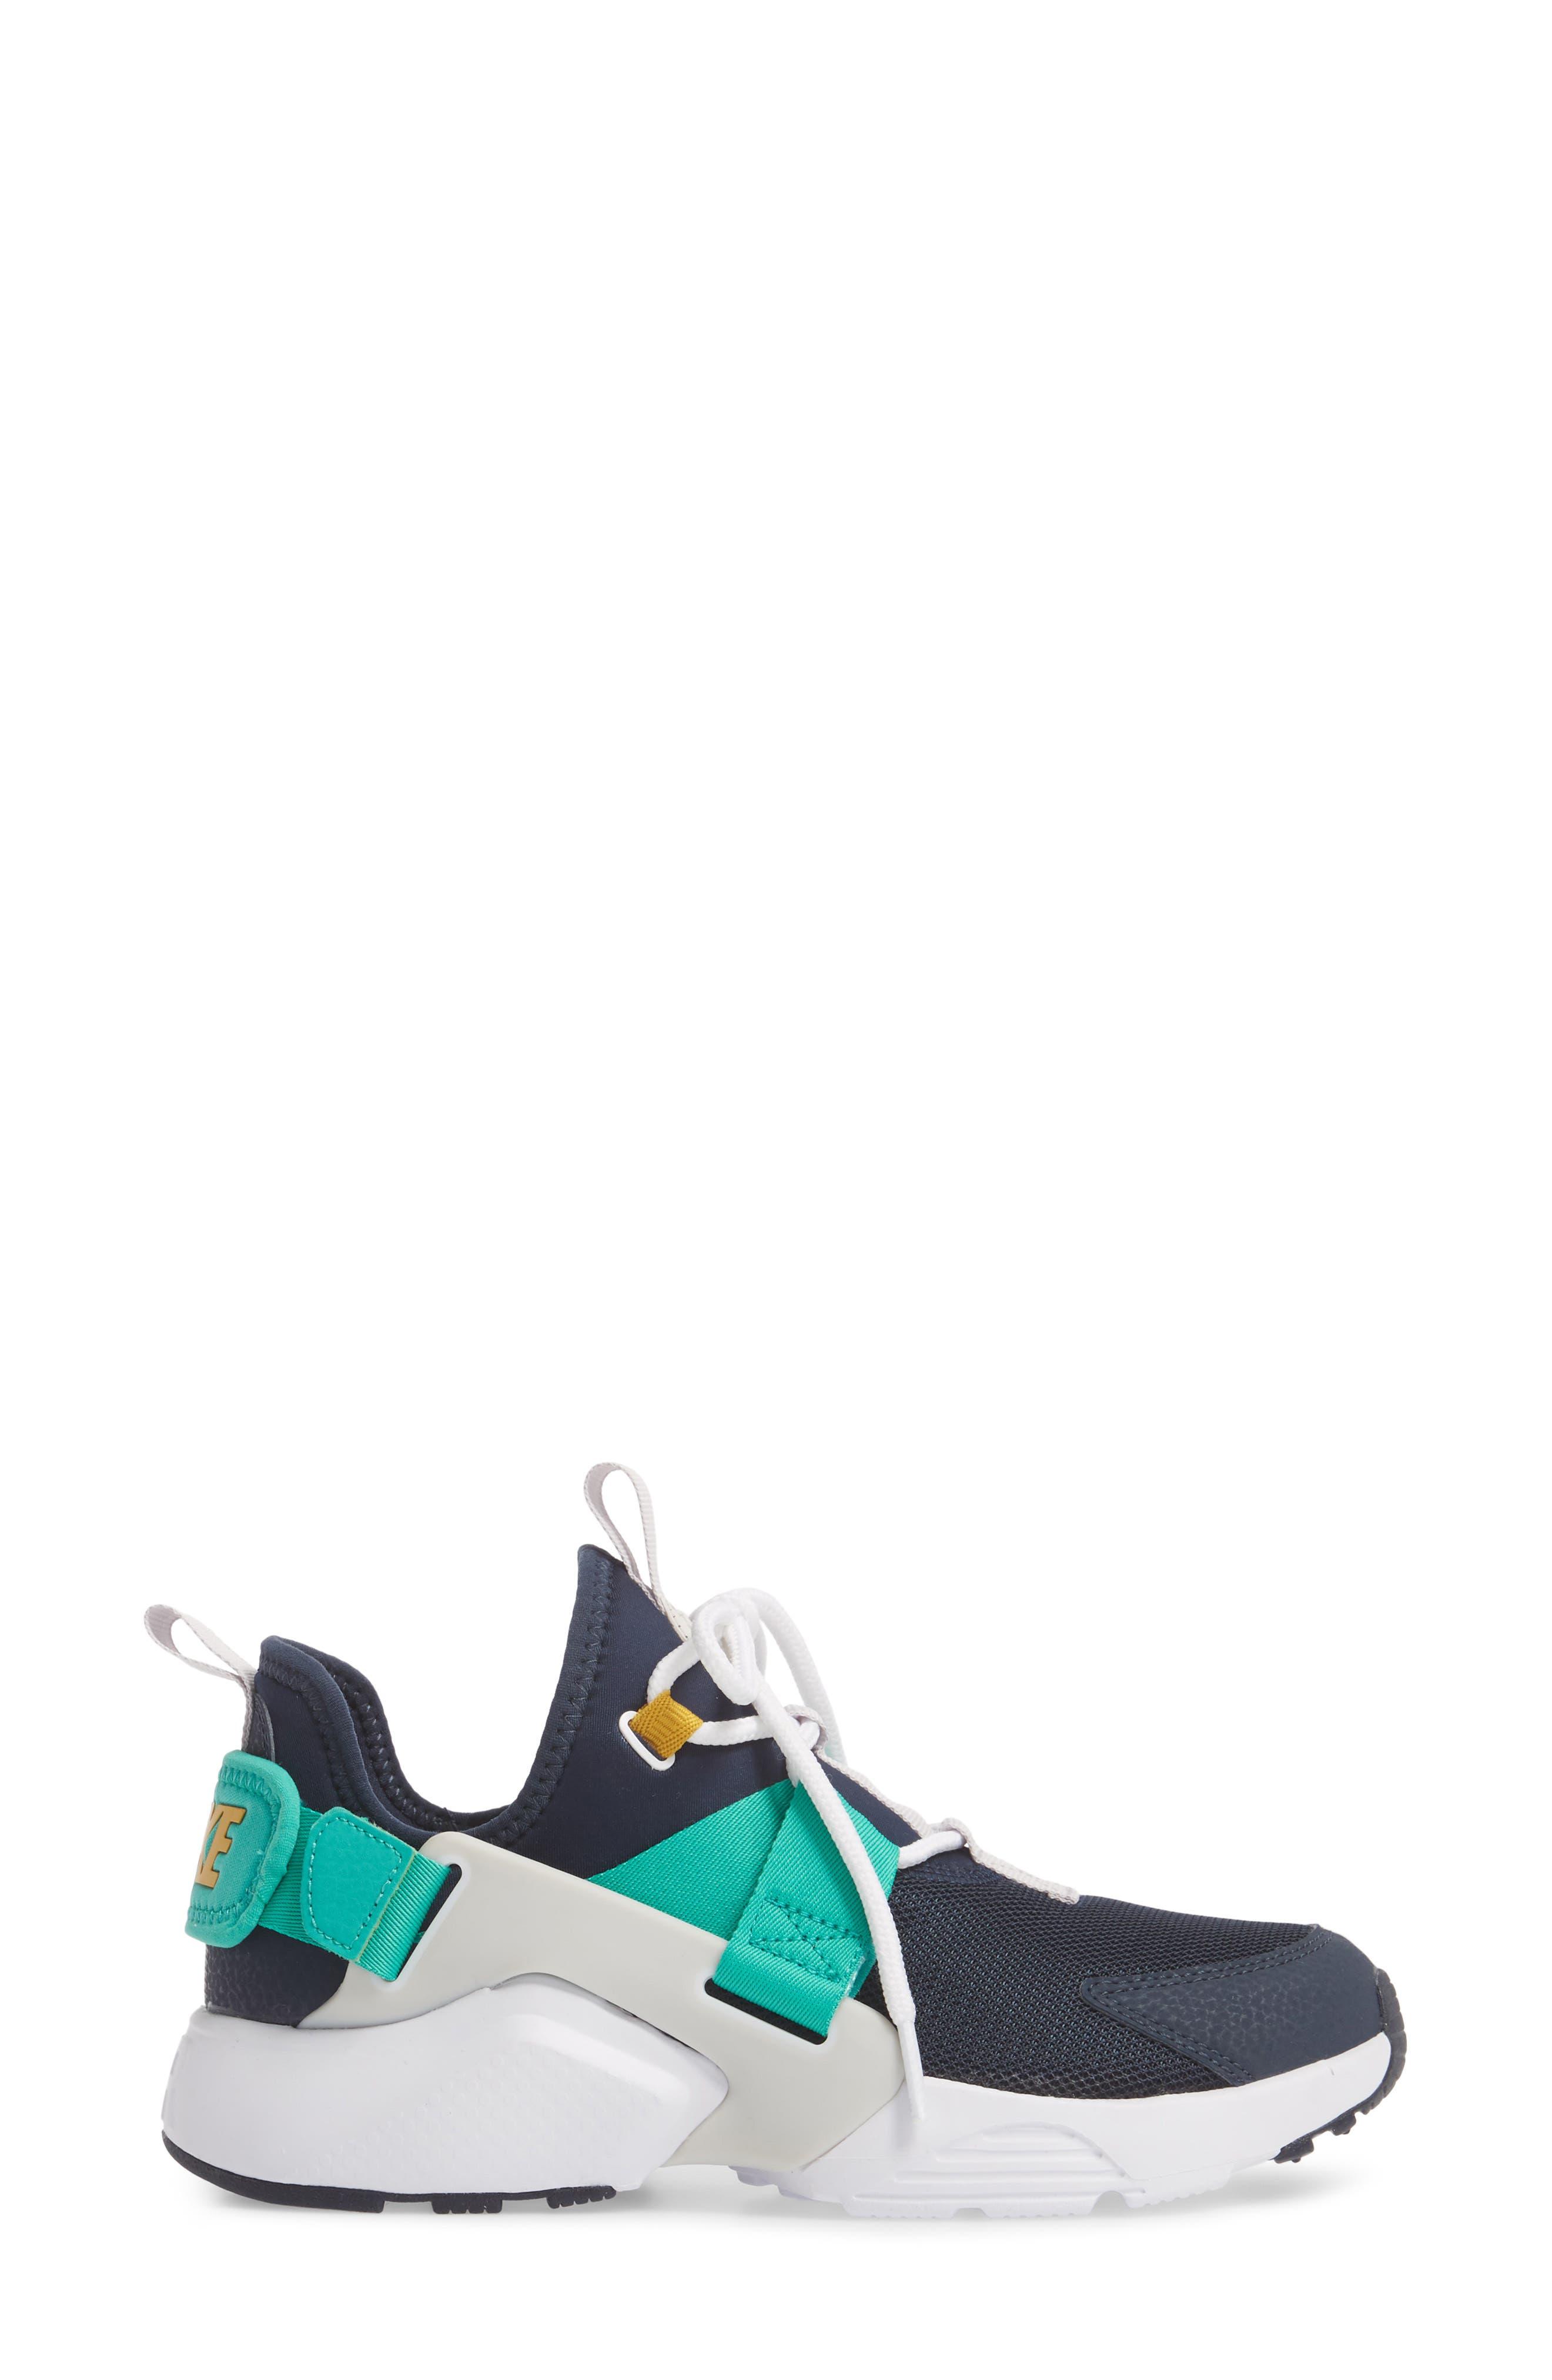 Air Huarache City Low Sneaker,                             Alternate thumbnail 3, color,                             Obsidian/ White/ Grey/ Green